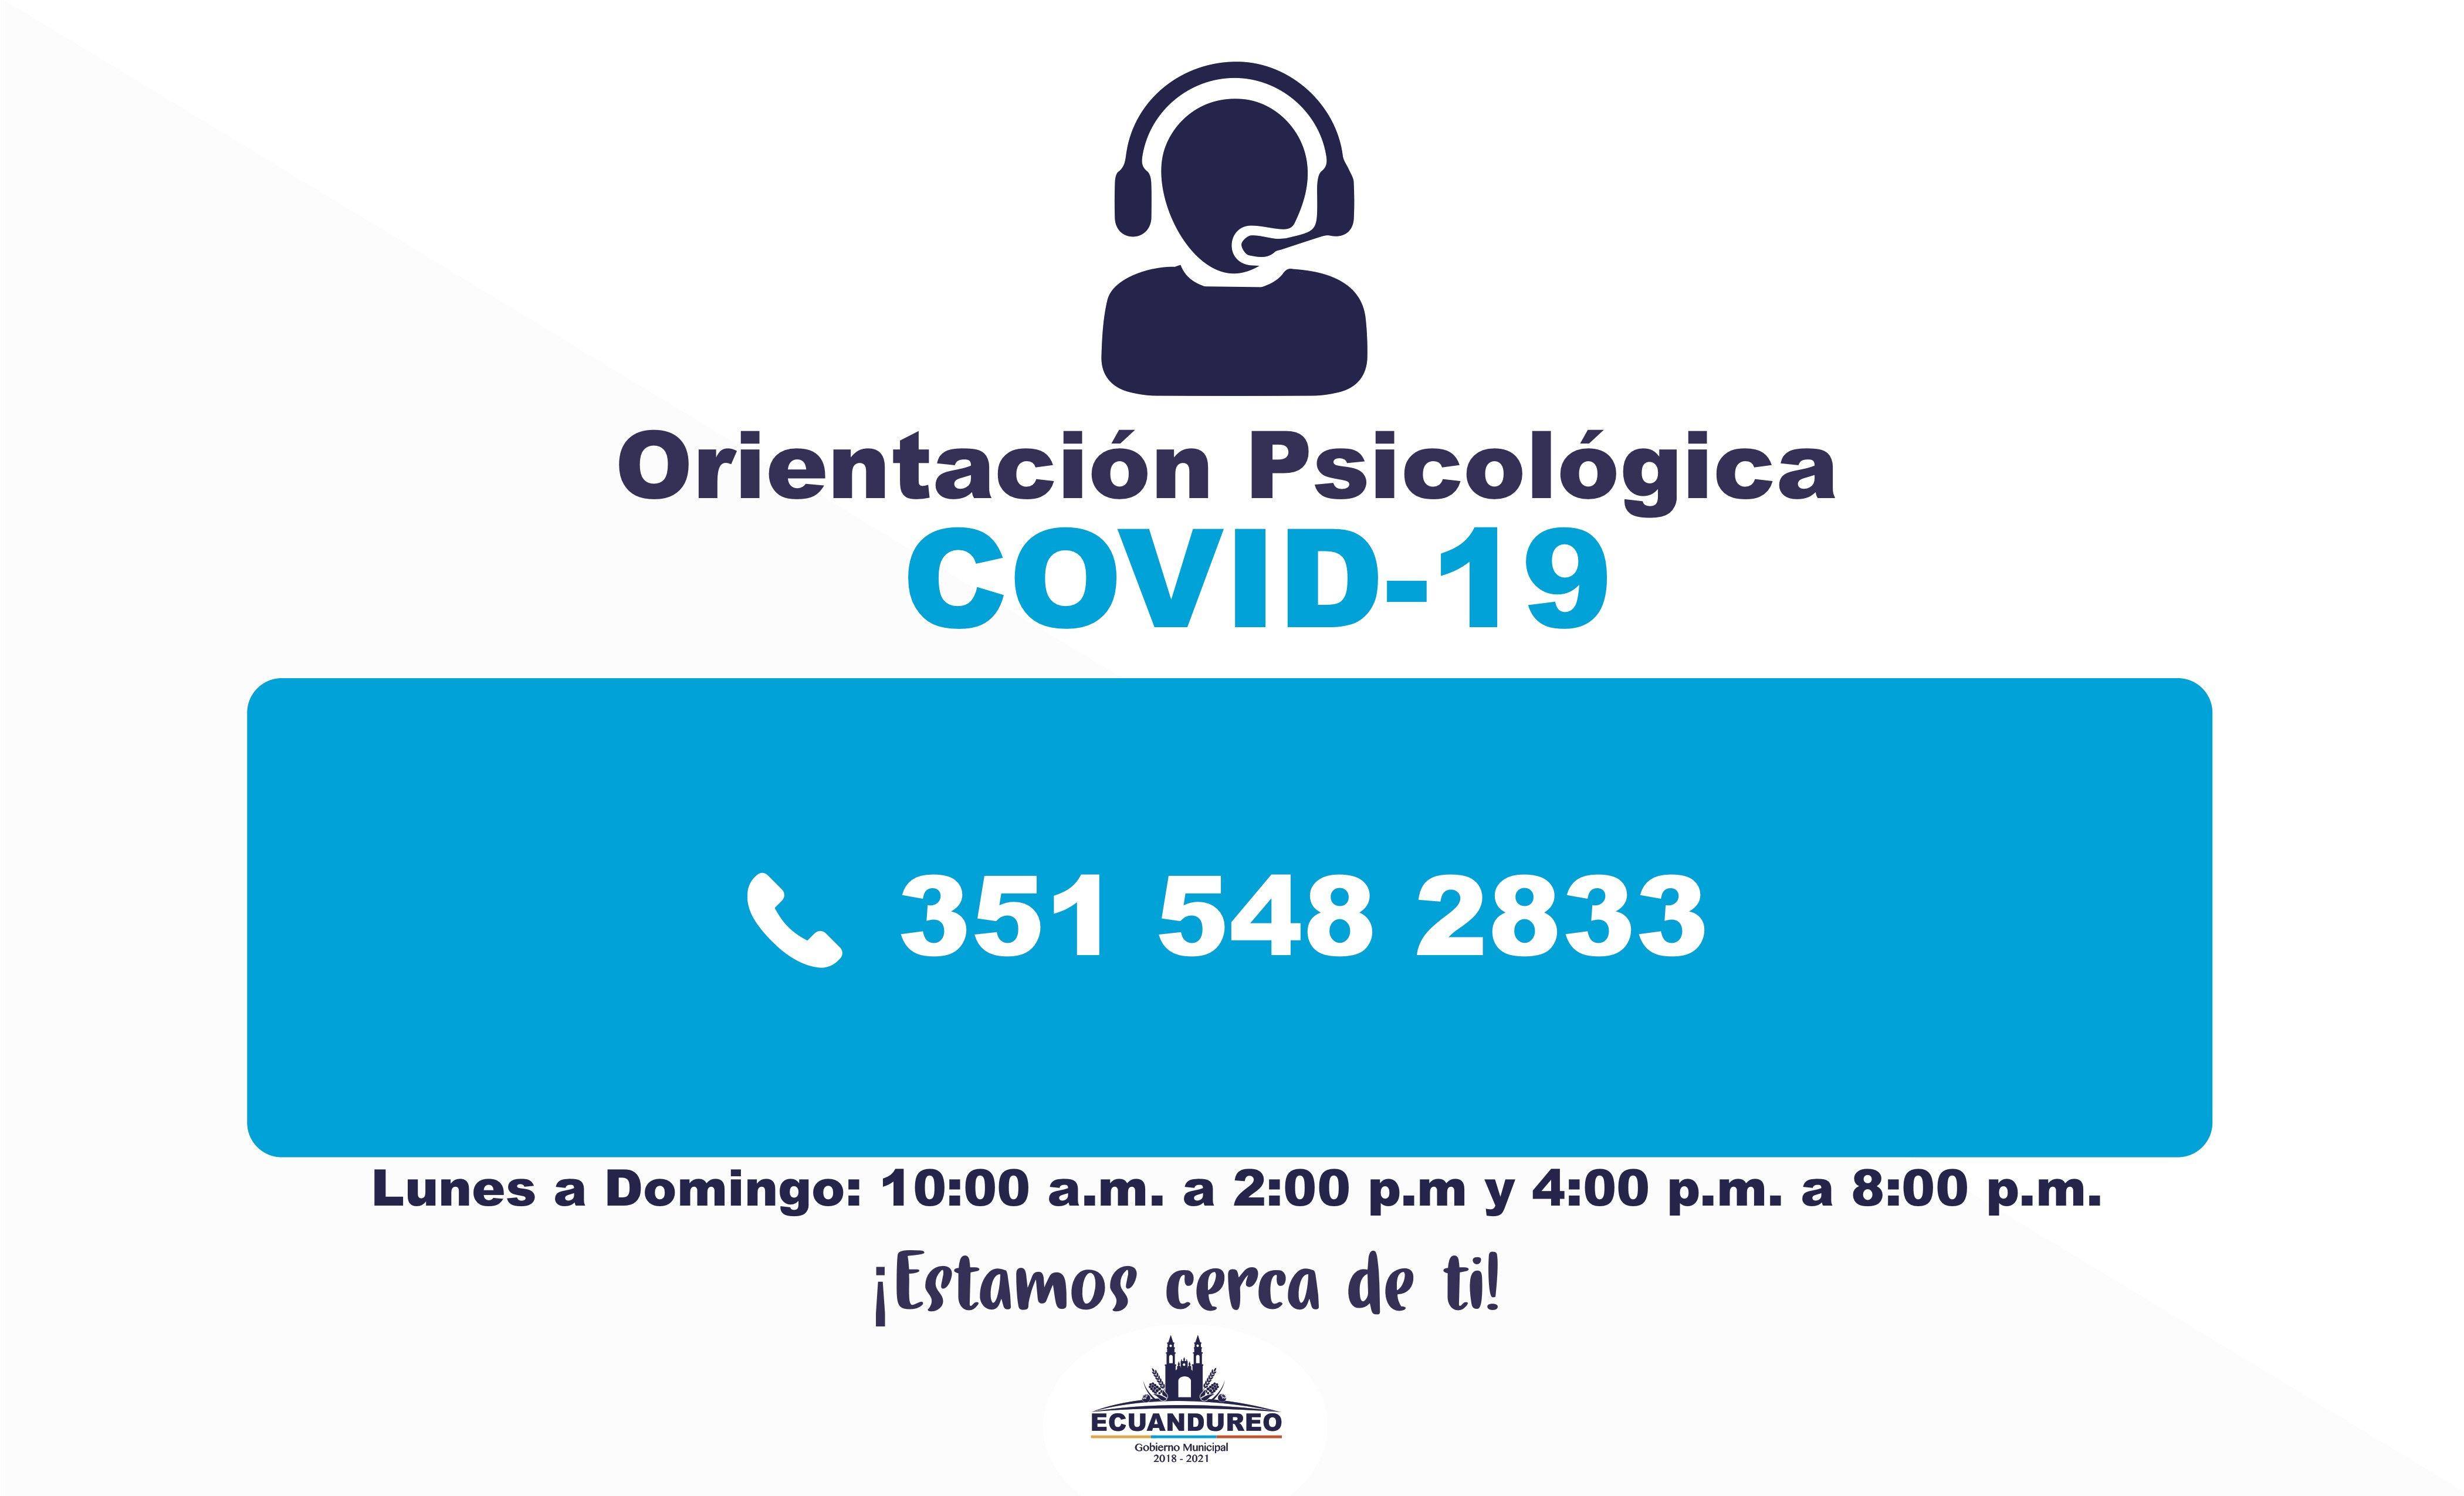 Plan Municipal COVID-19 Ecuandureo